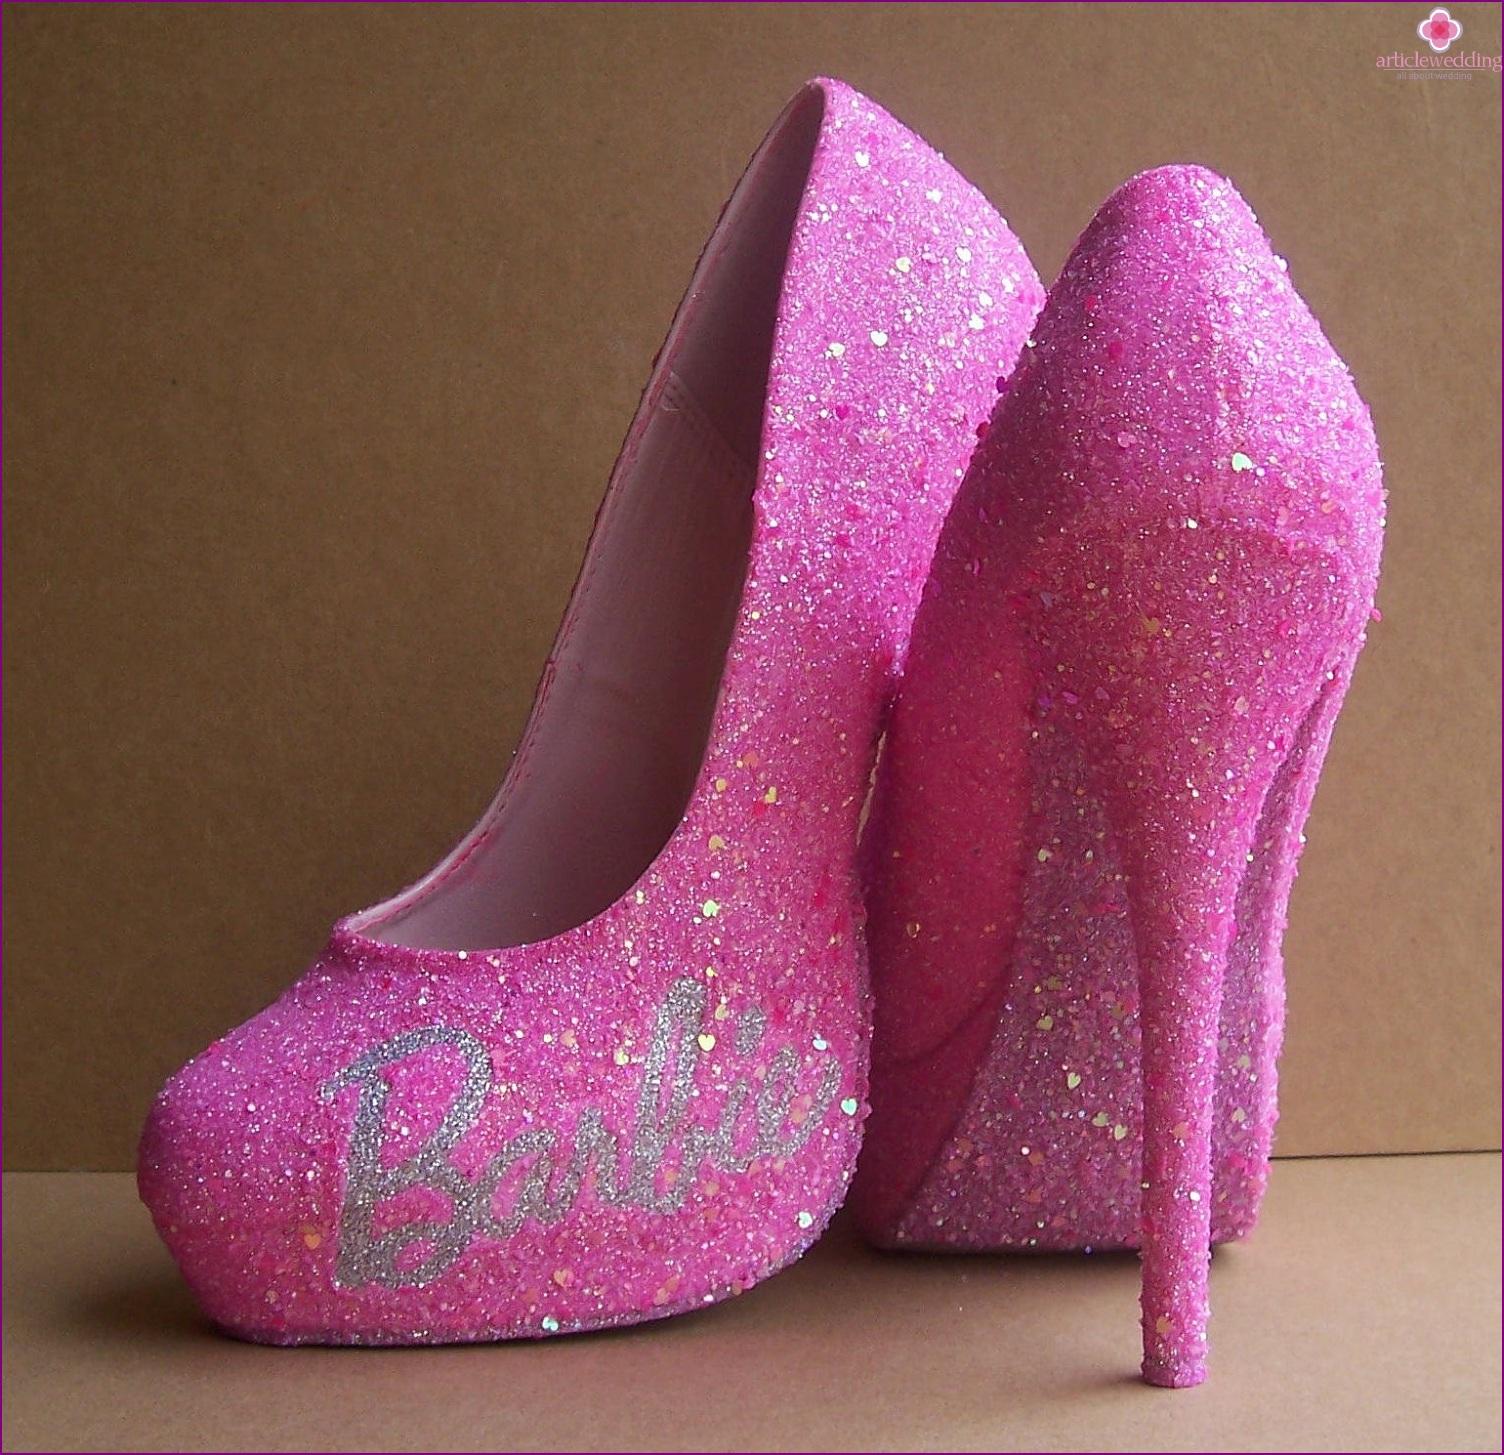 Shoes for a bachelorette party